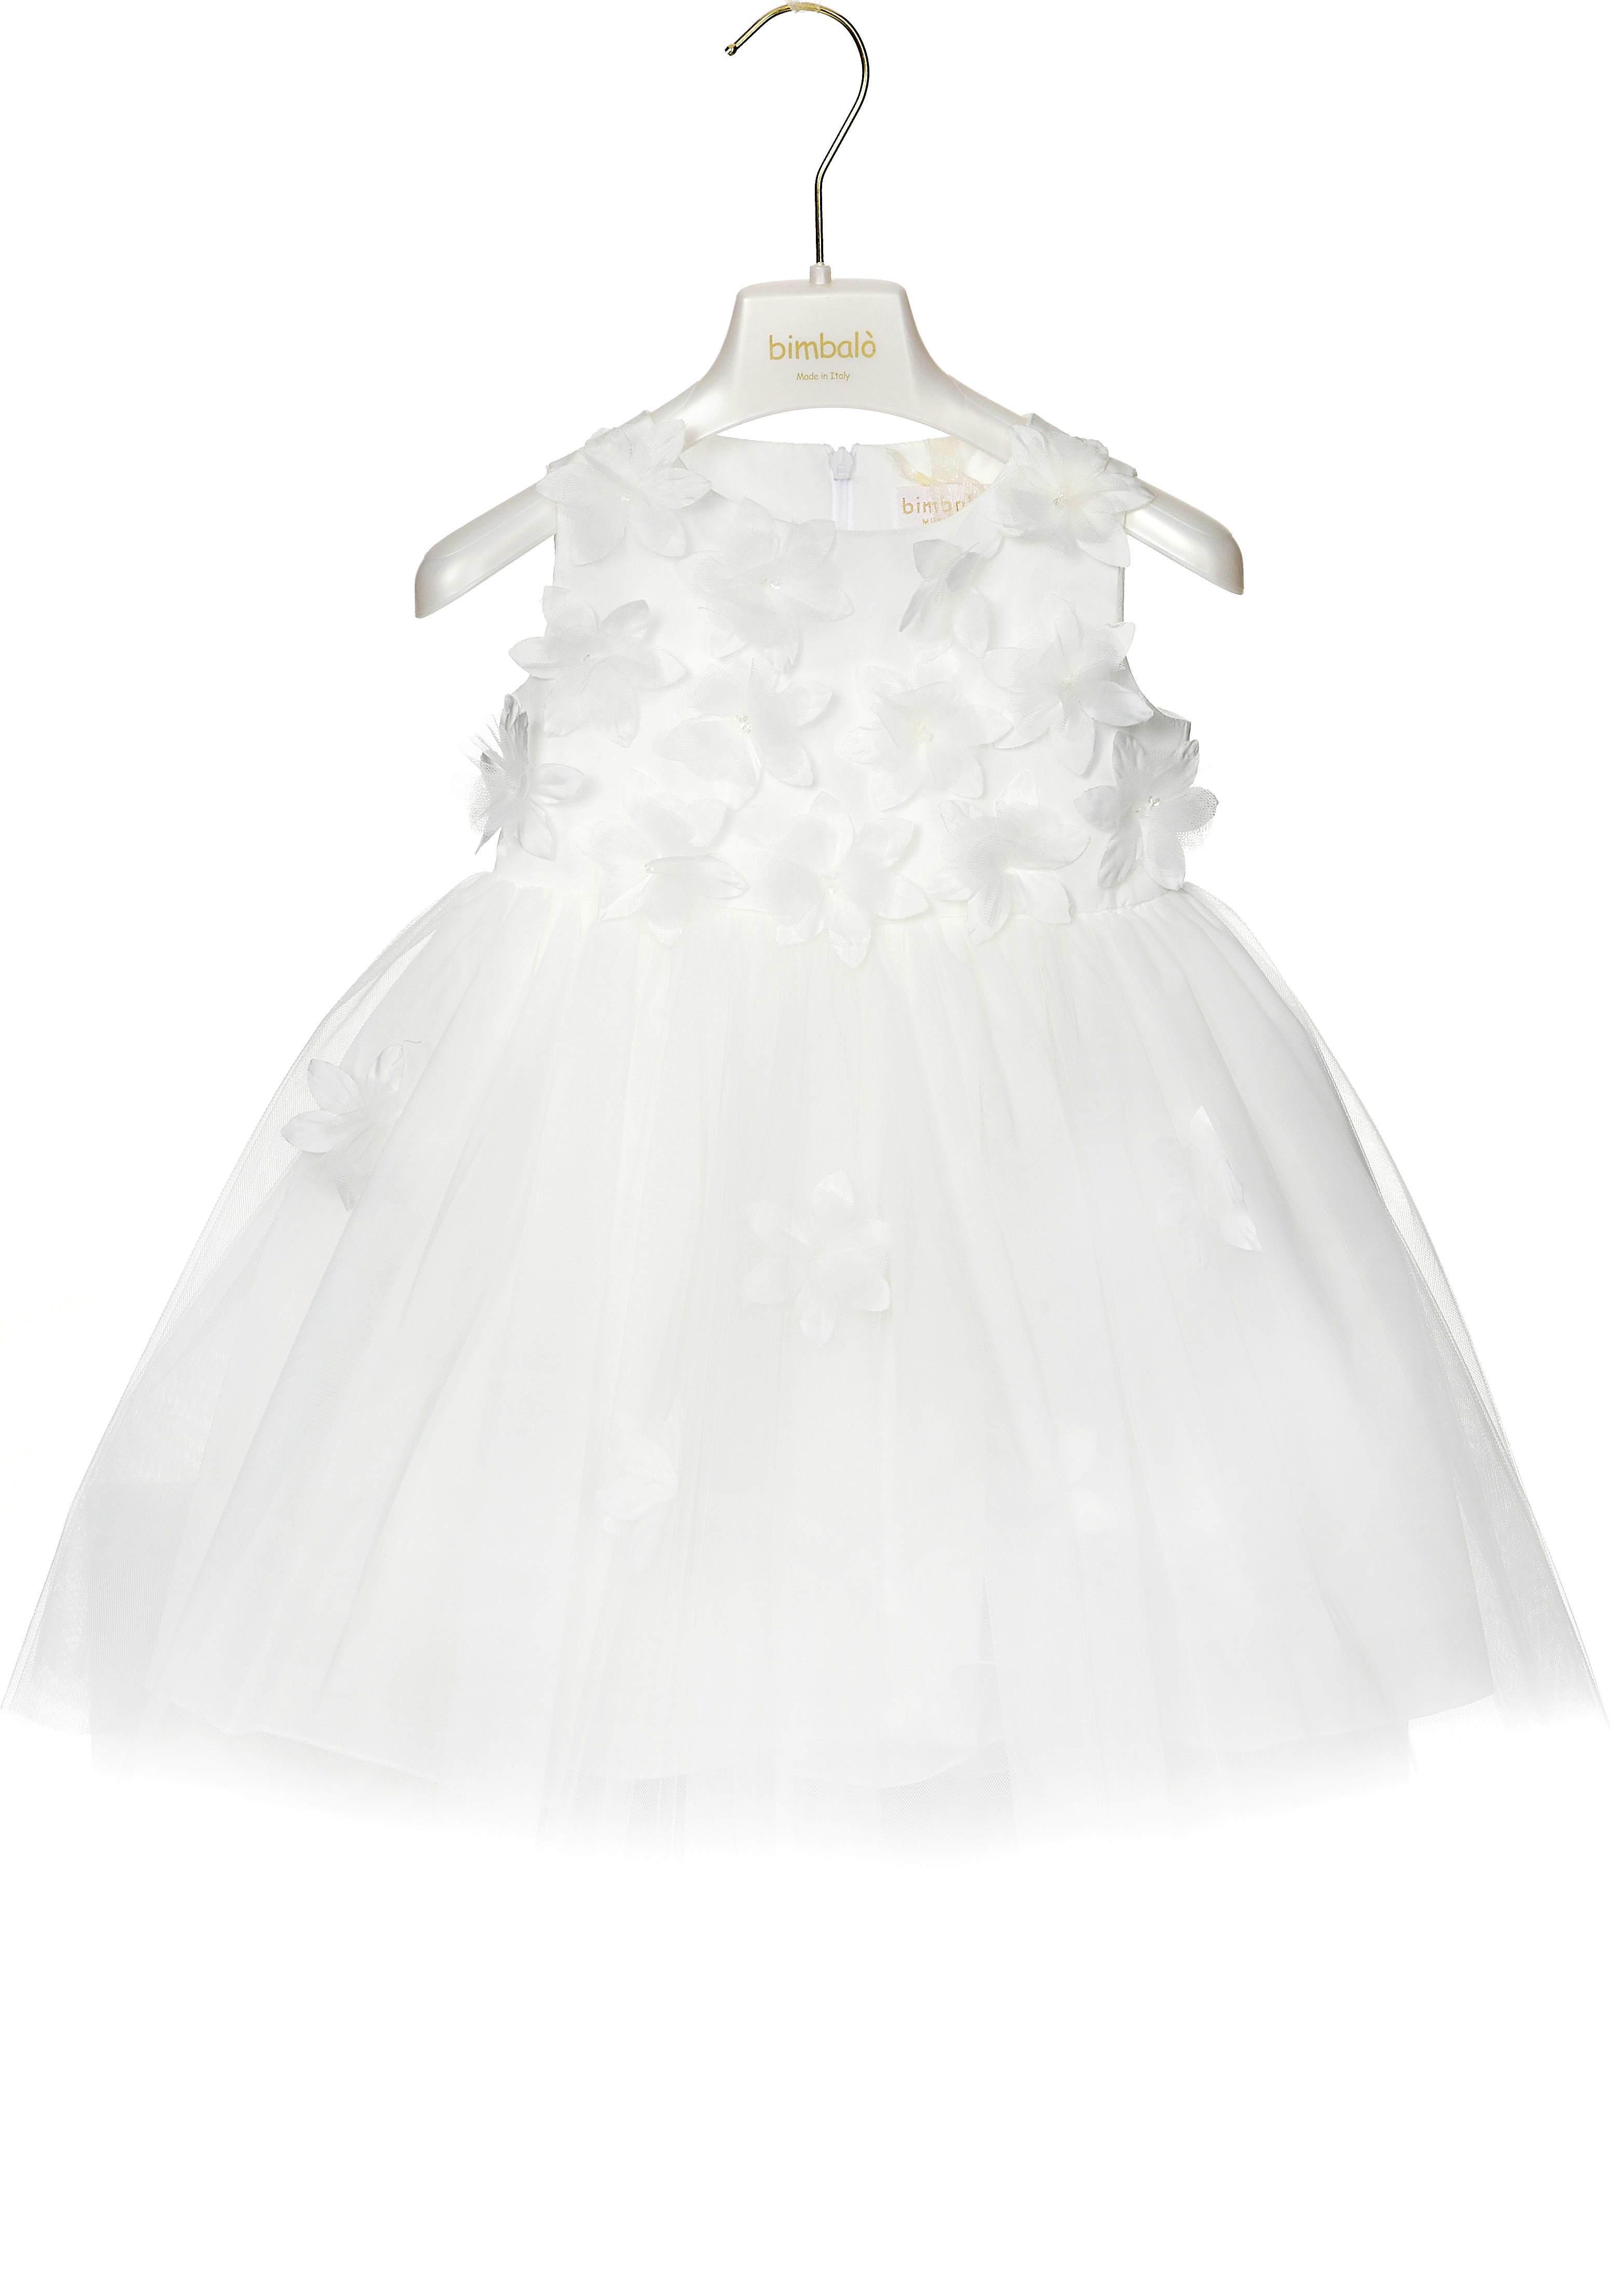 3129x4380 Bimbalo Festive White Dress Baby Bella Boutique